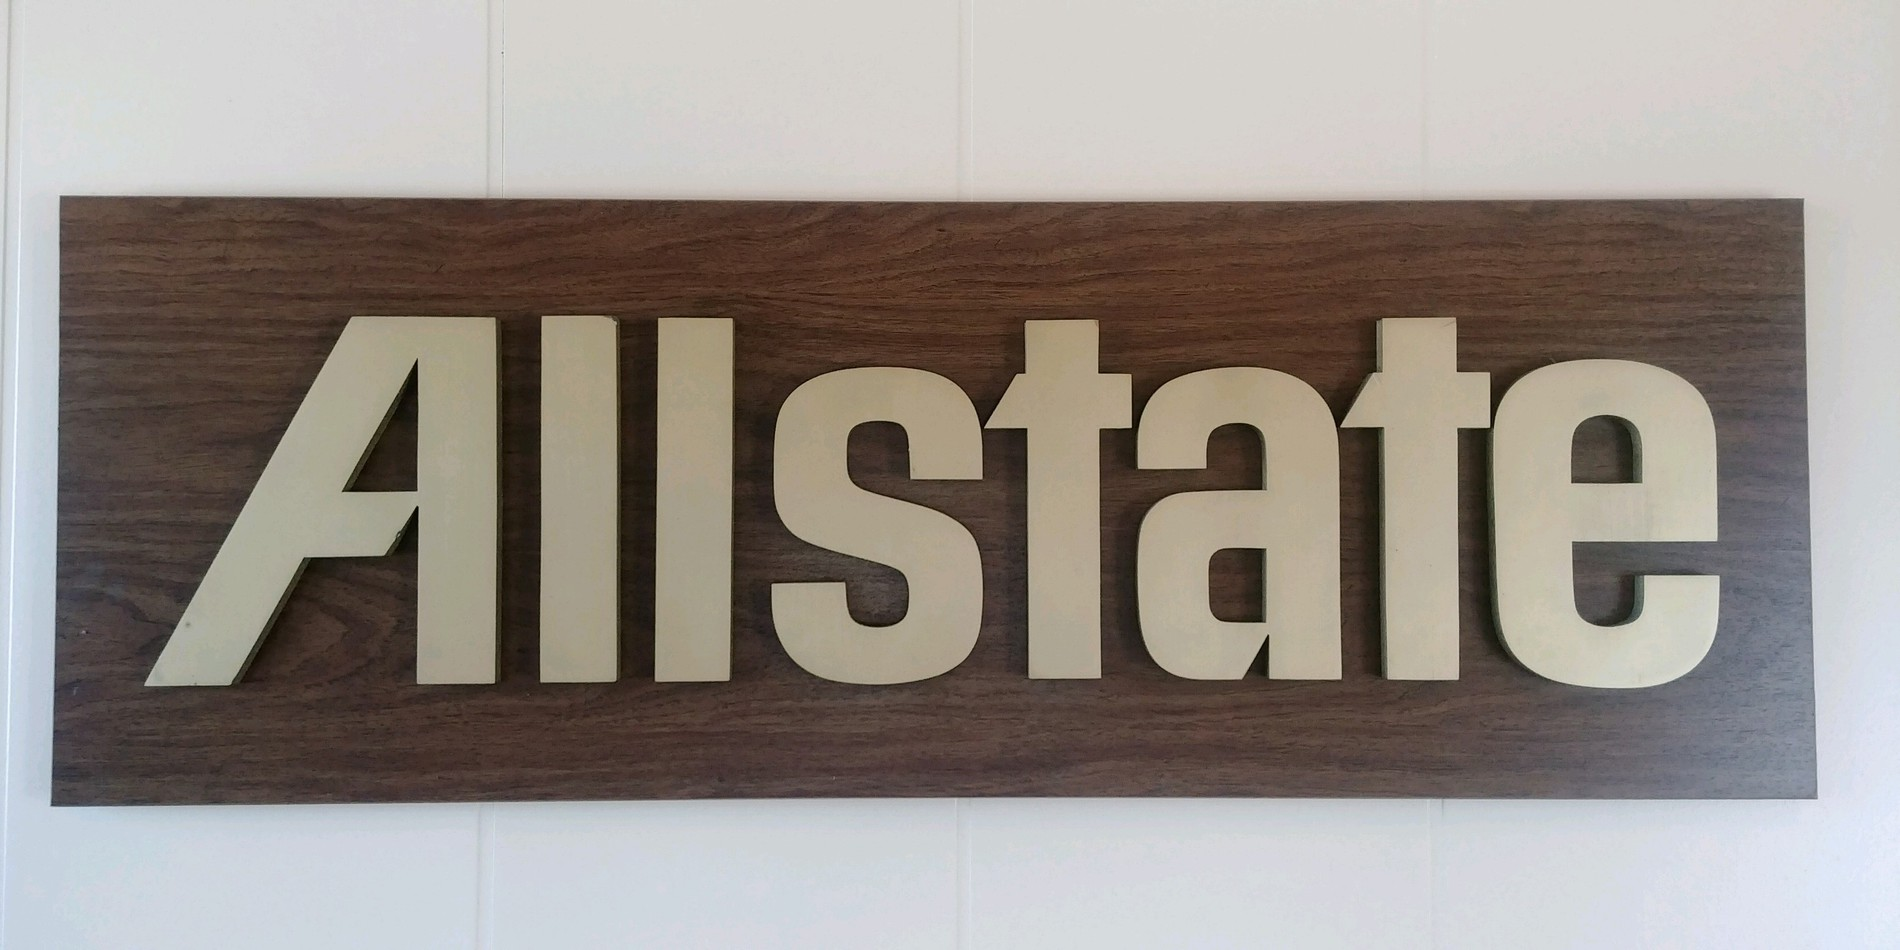 Allstate | Car Insurance in Meriden, CT - Patrick Huxley